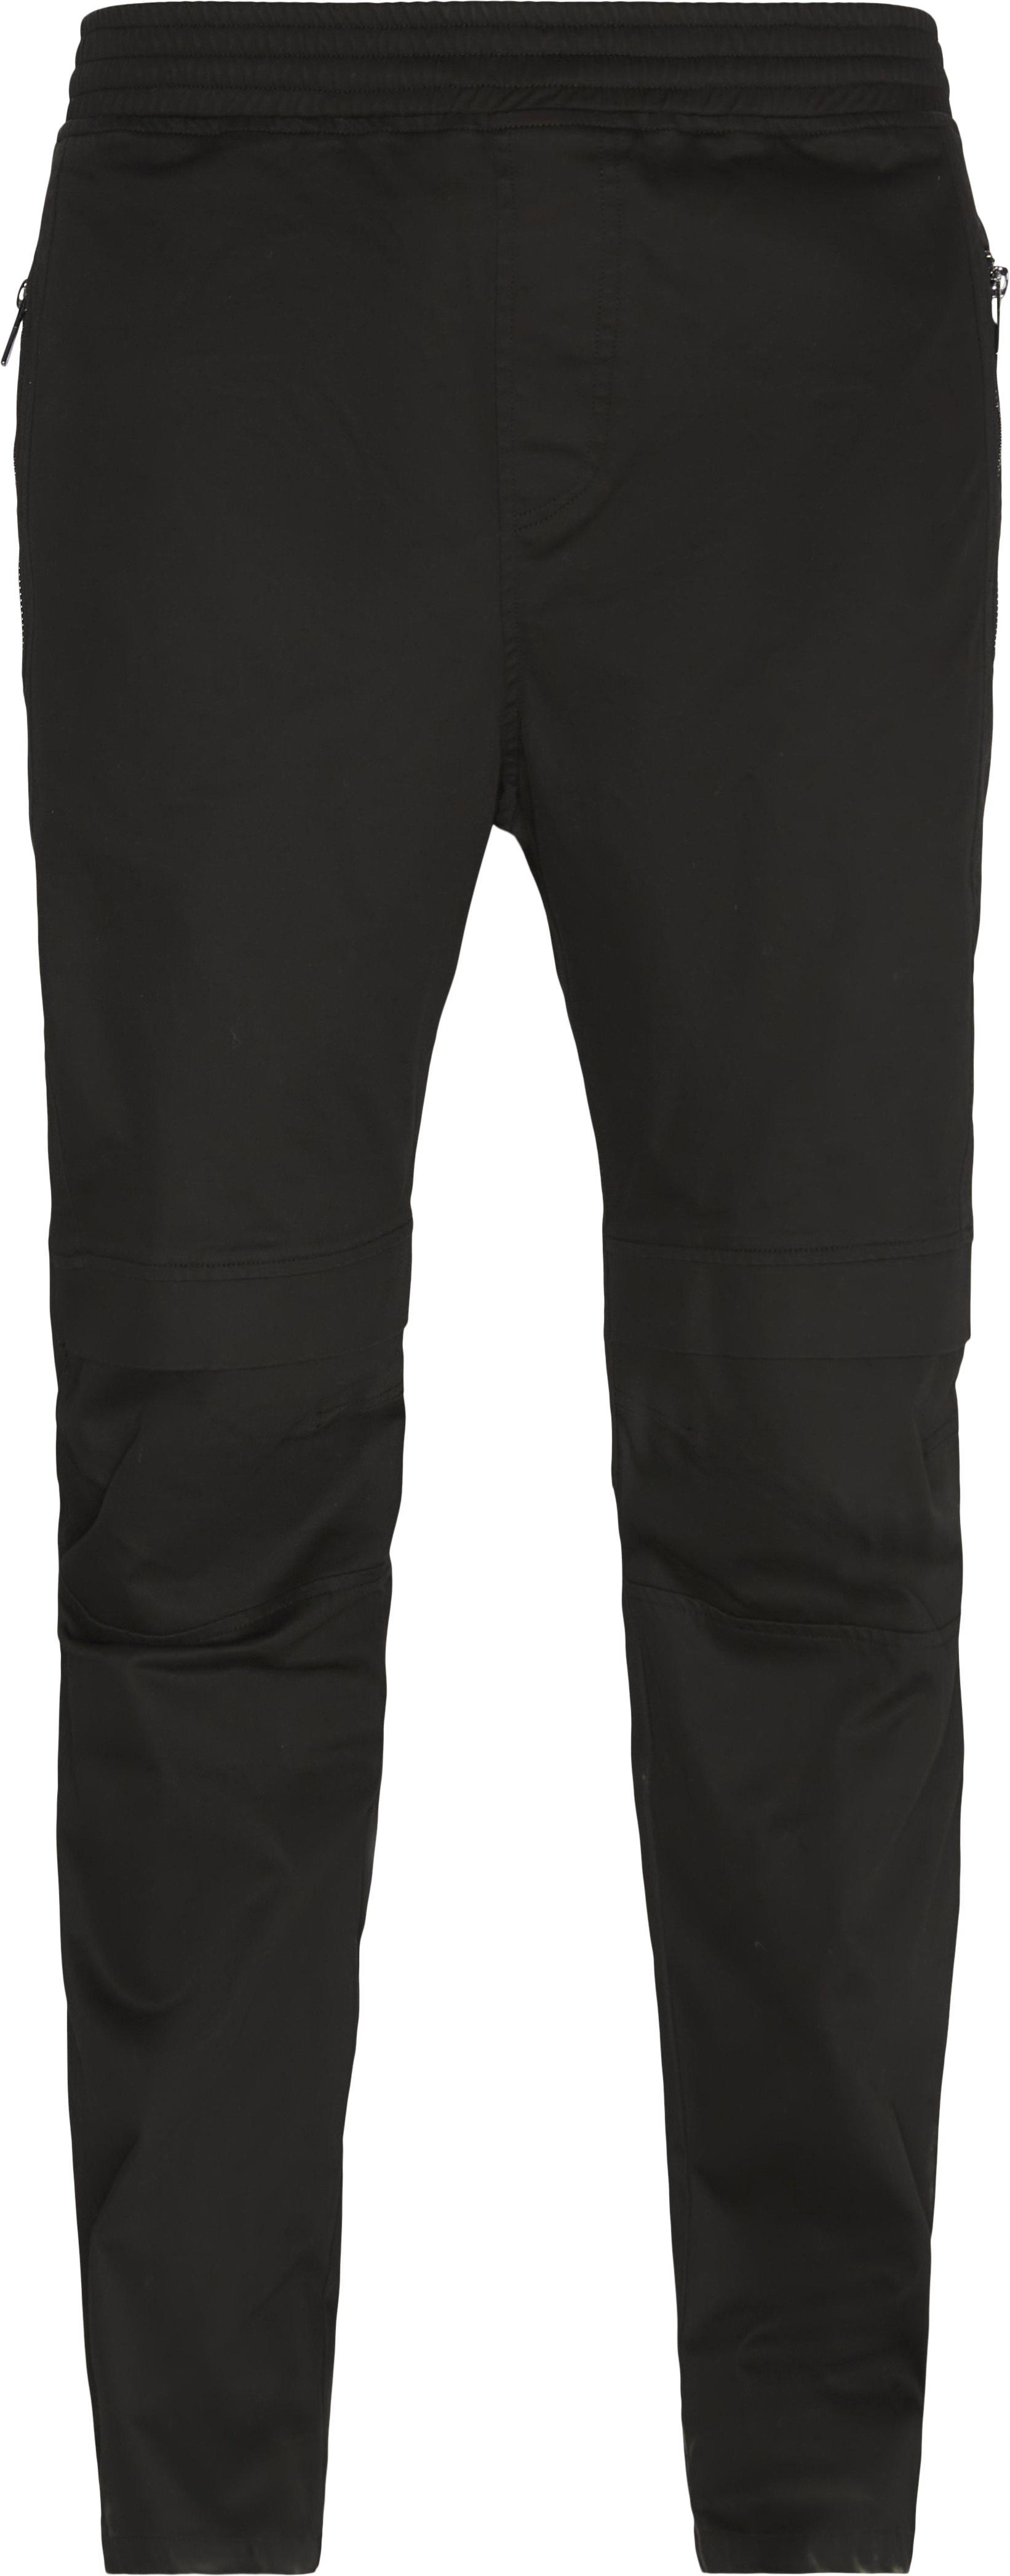 Foster Pants - Bukser - Regular fit - Sort